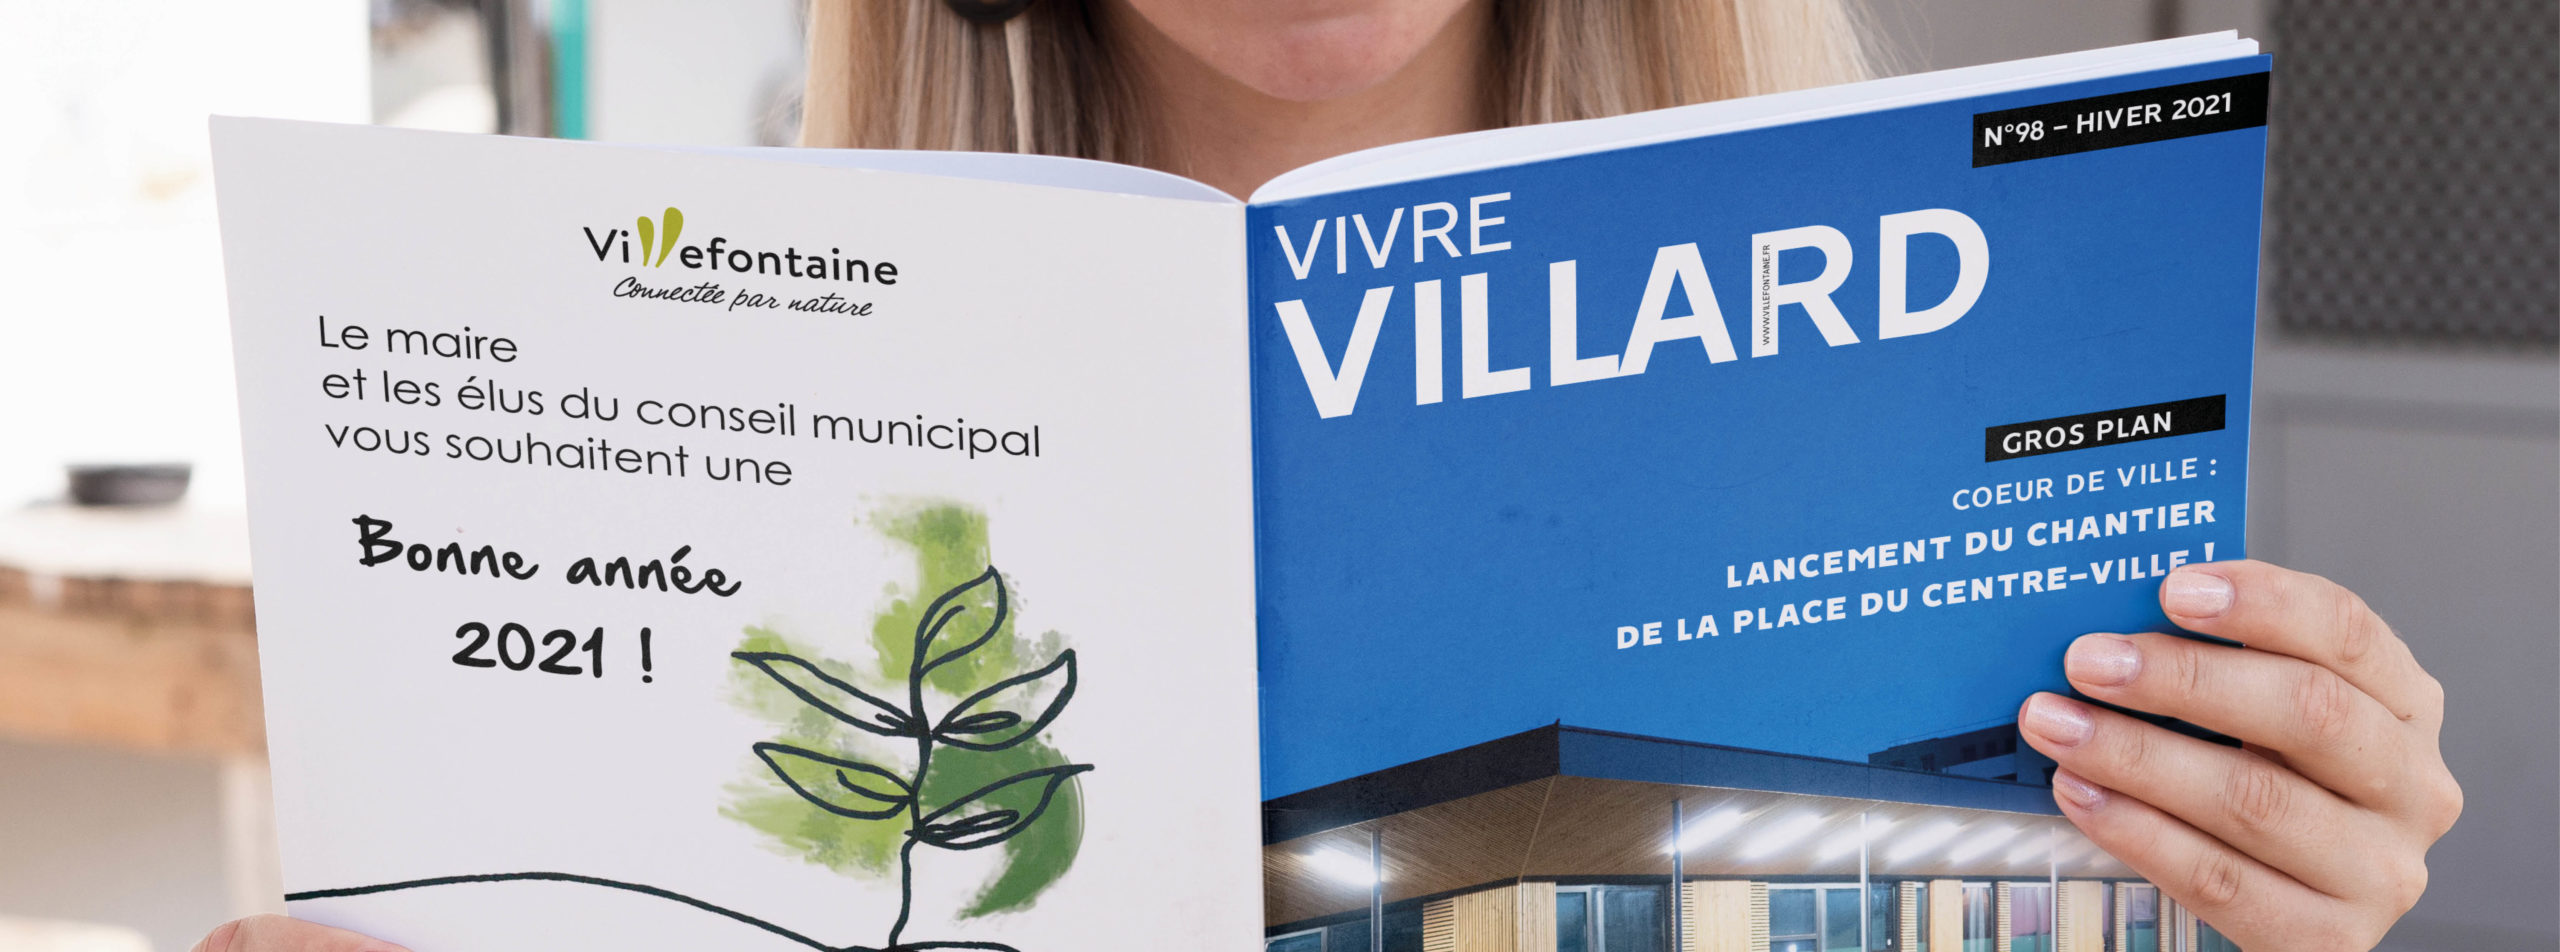 Vivre Villard 98 - focus site